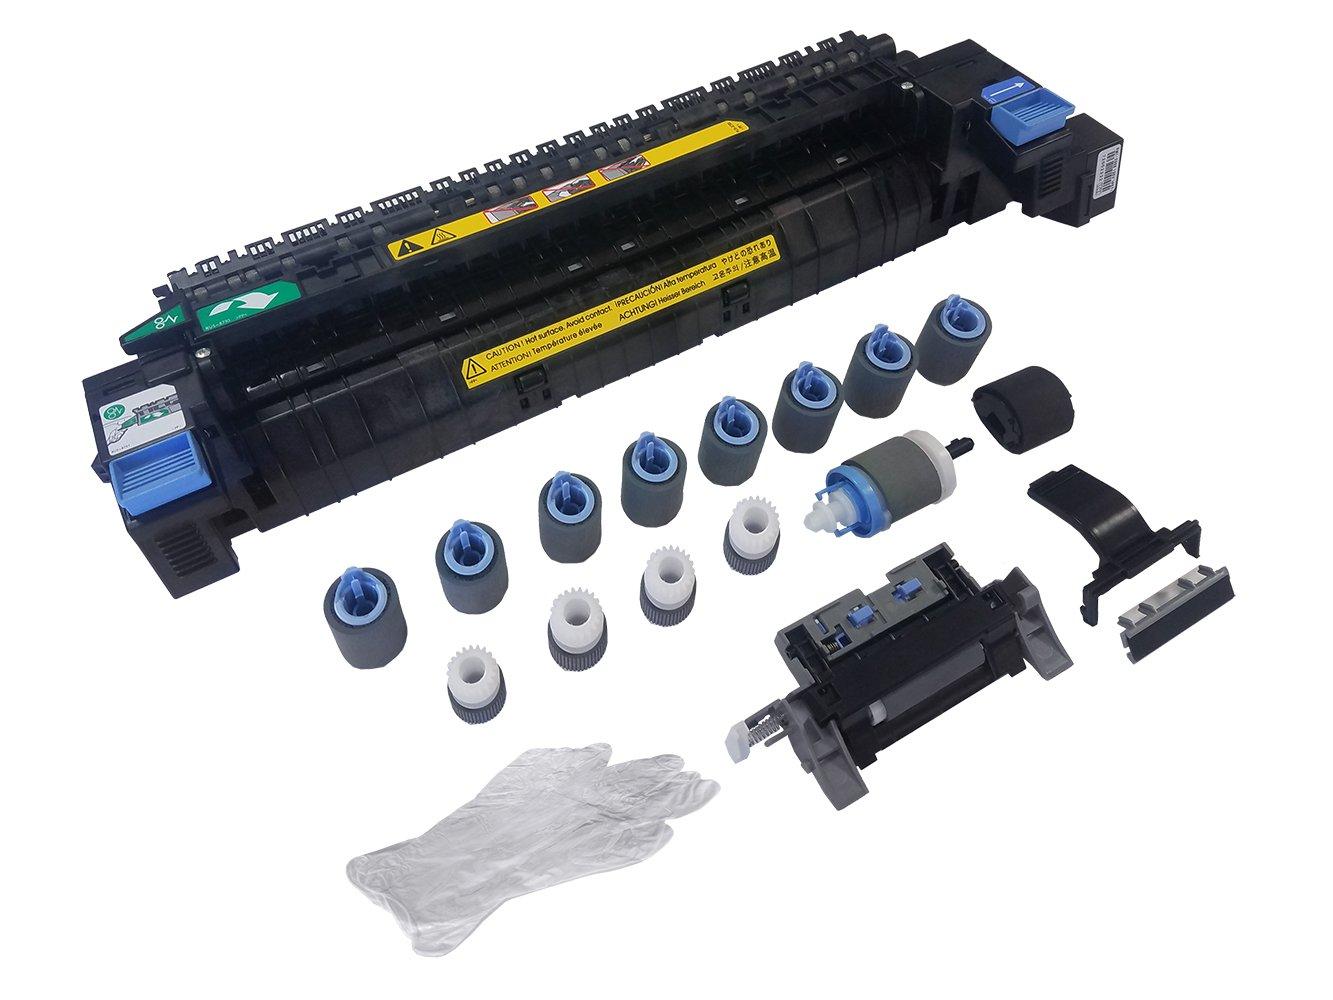 Altru Print CE977A-MK-AP Maintenance Kit for HP Color Laserjet Enterprise CP5520 Series CP5525 / M750 (110V) Includes RM1-6180 (CE707-67912) Fuser & Rollers for Tray 1/2/3/4/5/6 by Altru Print (Image #1)